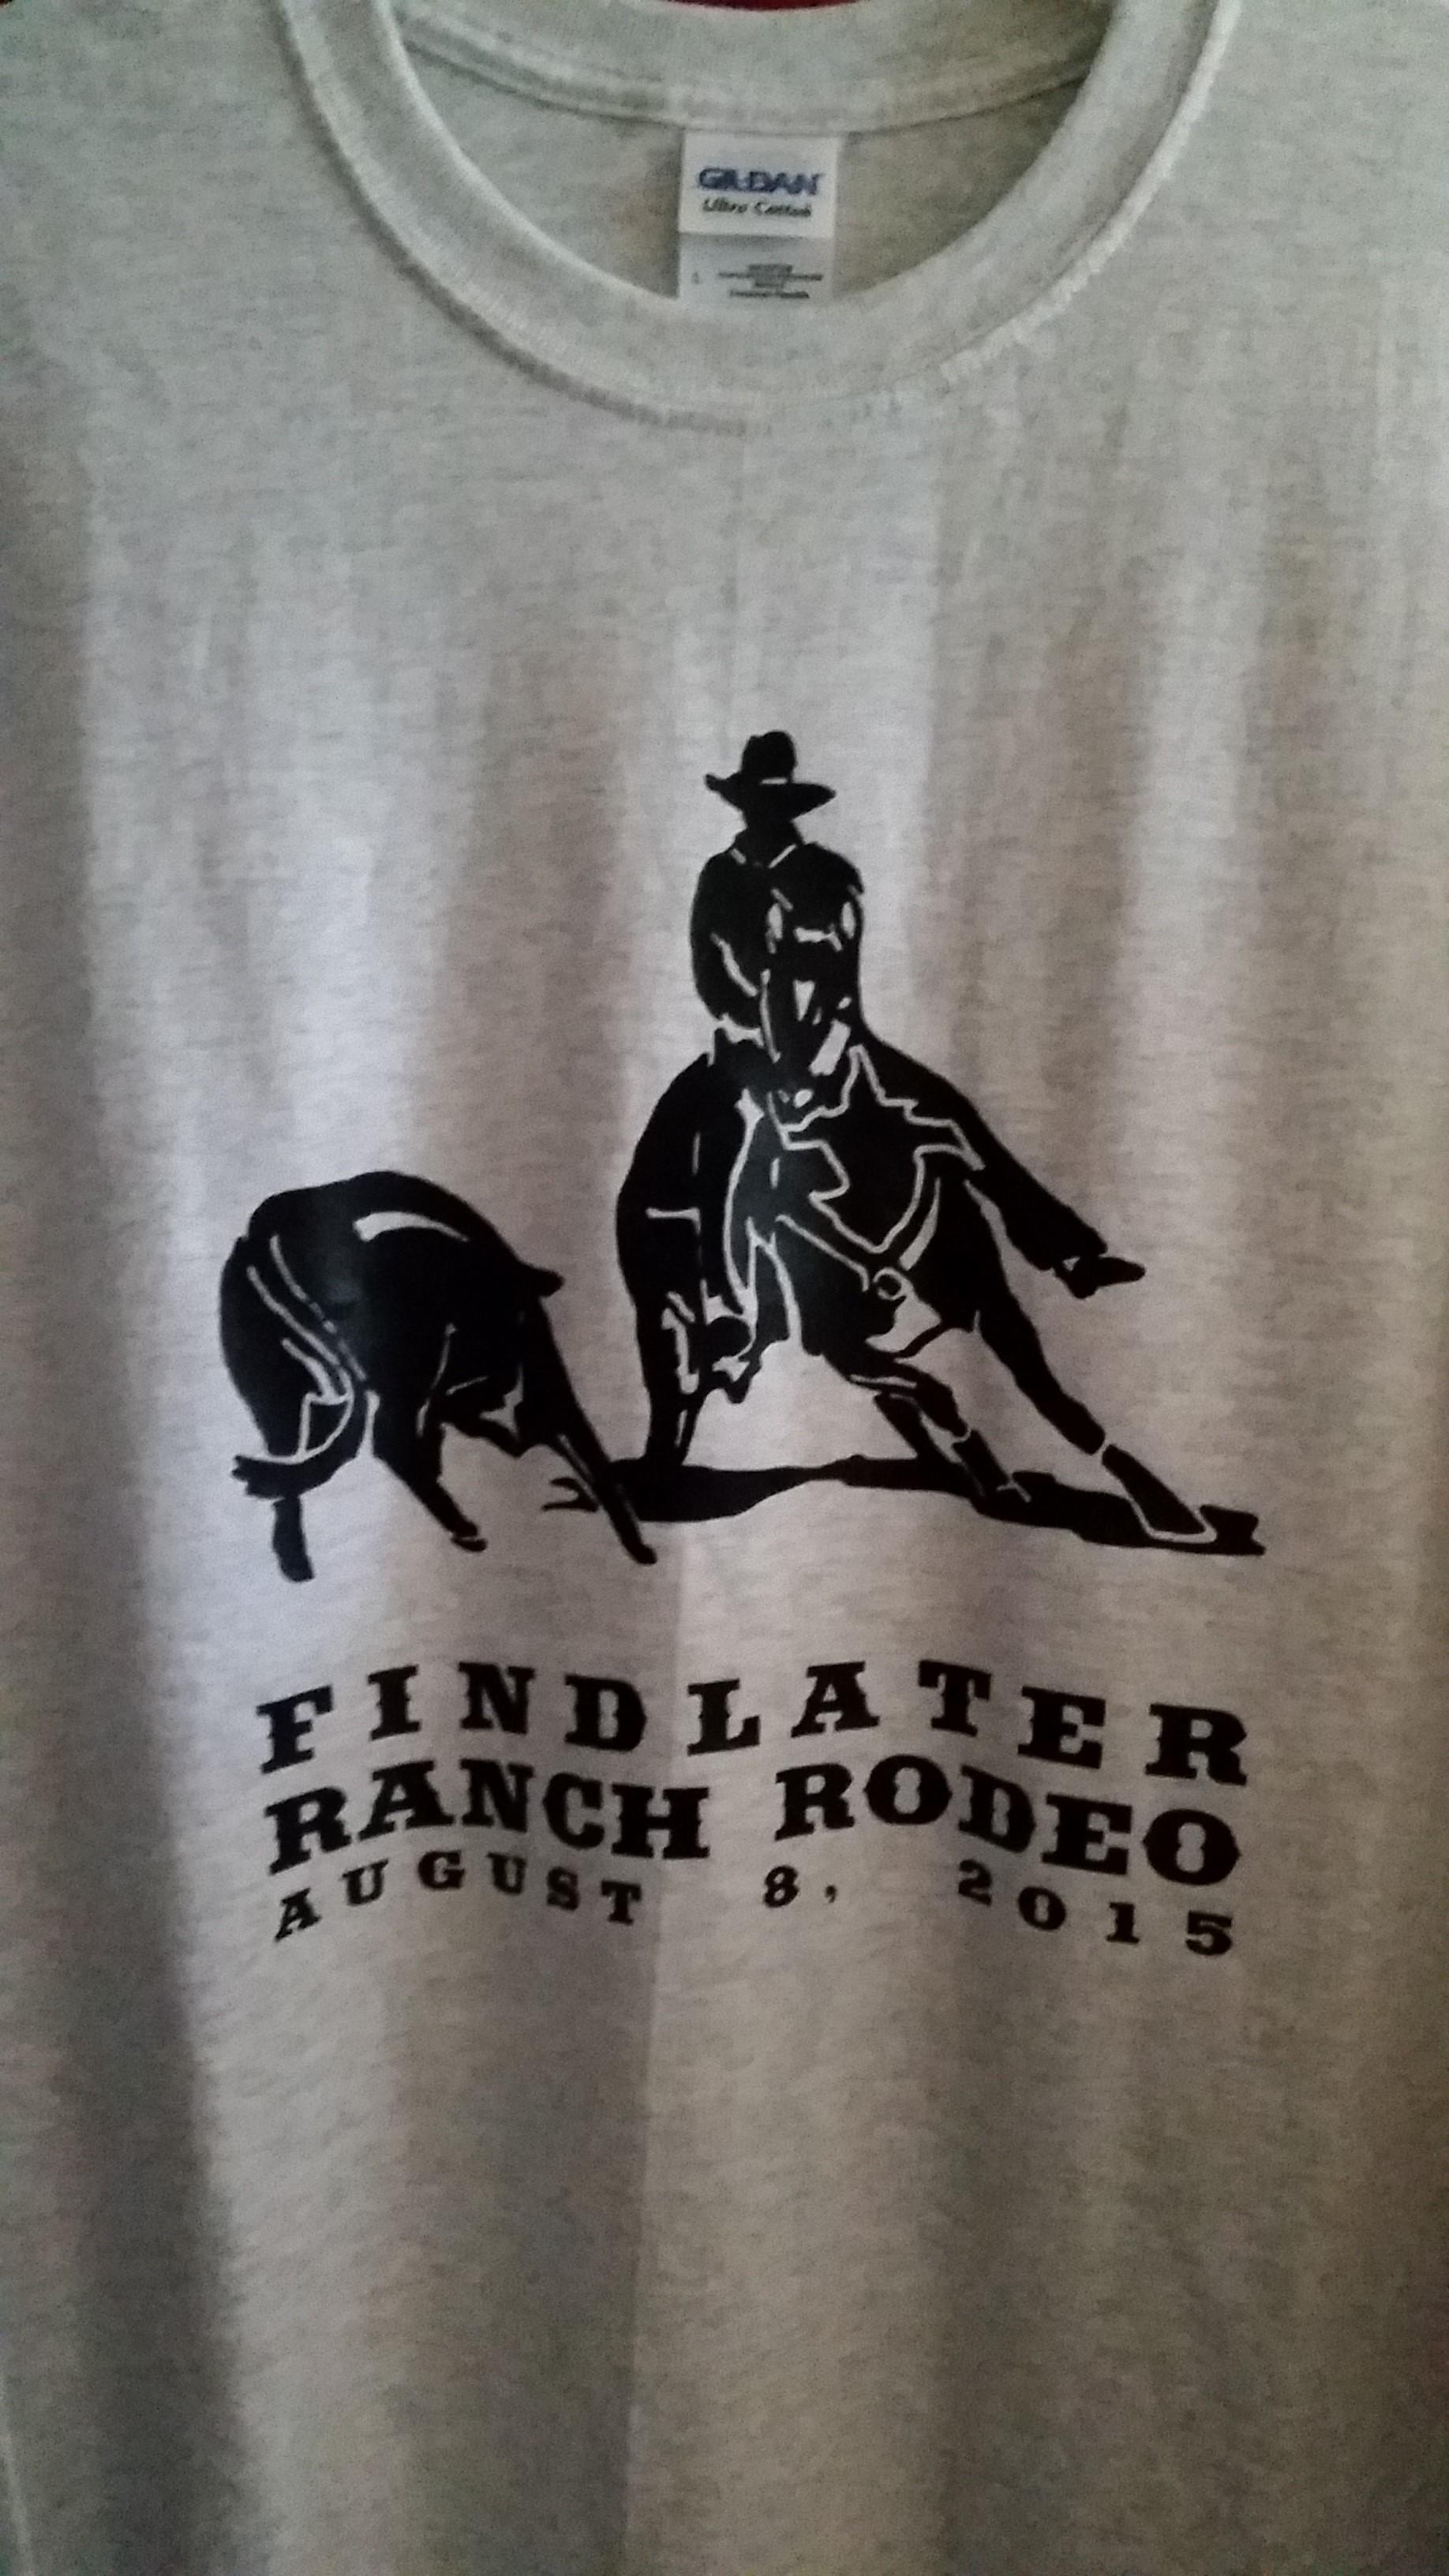 Rodeo shirts